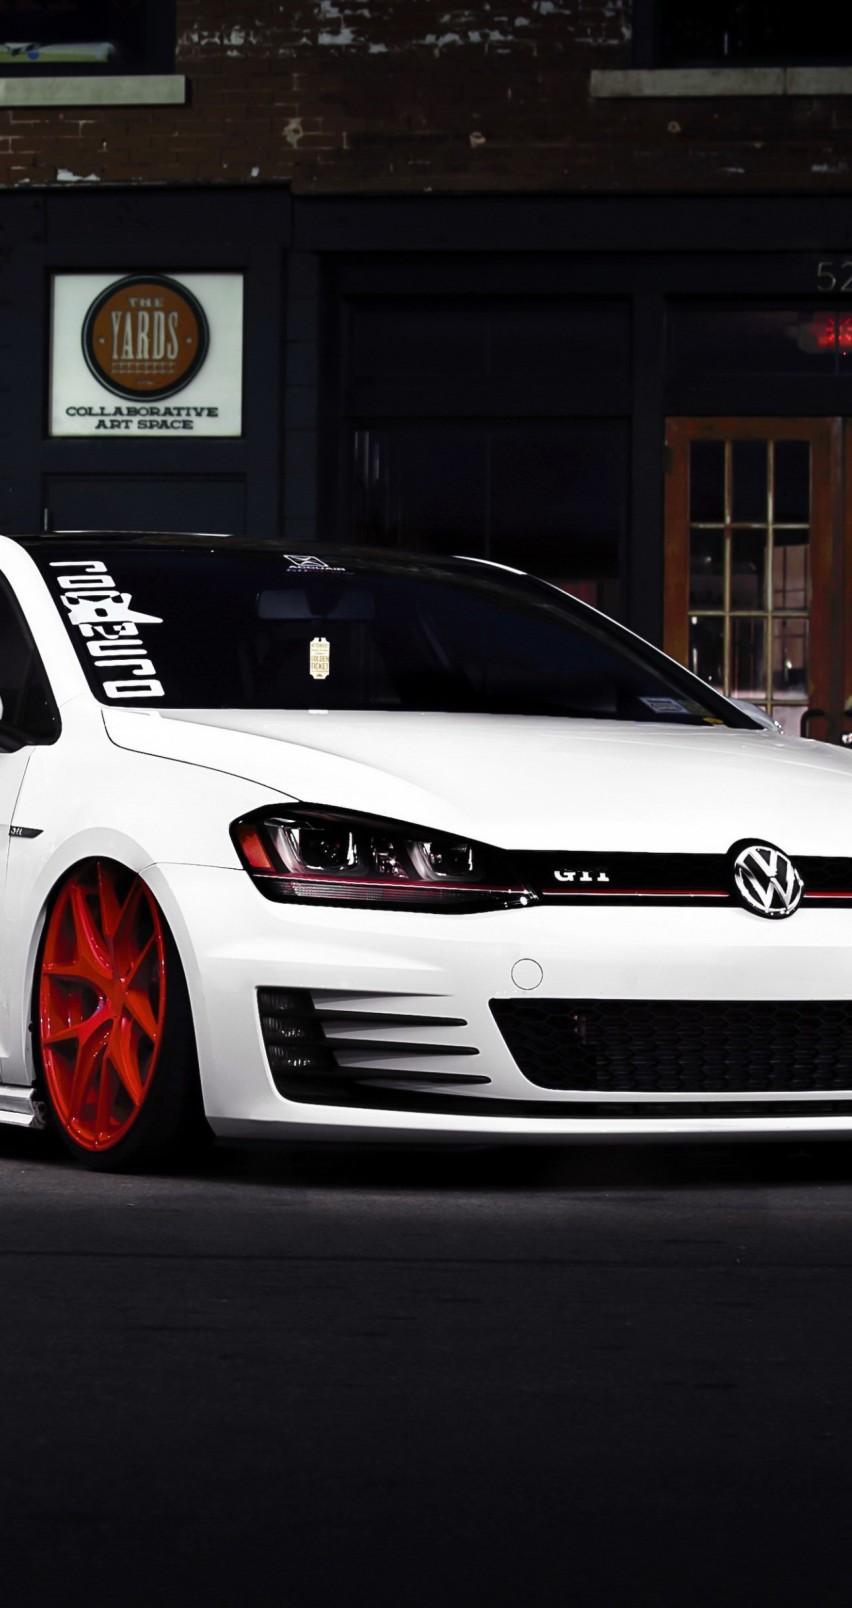 White Volkswagen Golf GTI Wallpaper For Apple IPhone 6Gti Iphone